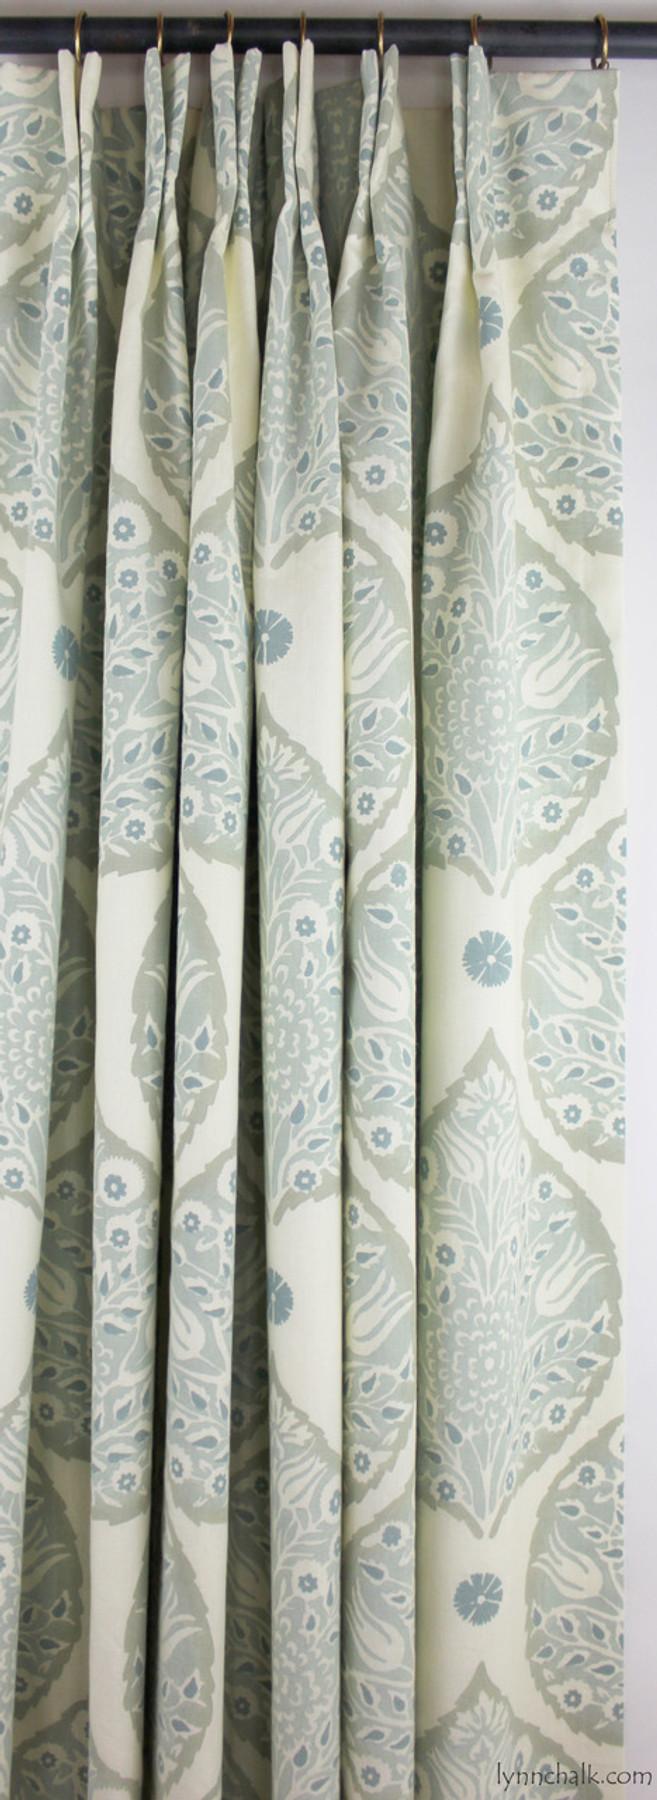 Galbraith and Paul Lotus Wallpaper in Aqua Bedroom (Ryland Witt Interior Design) Wallpaper Sold By The Yard - 5 Yard Minimum Order